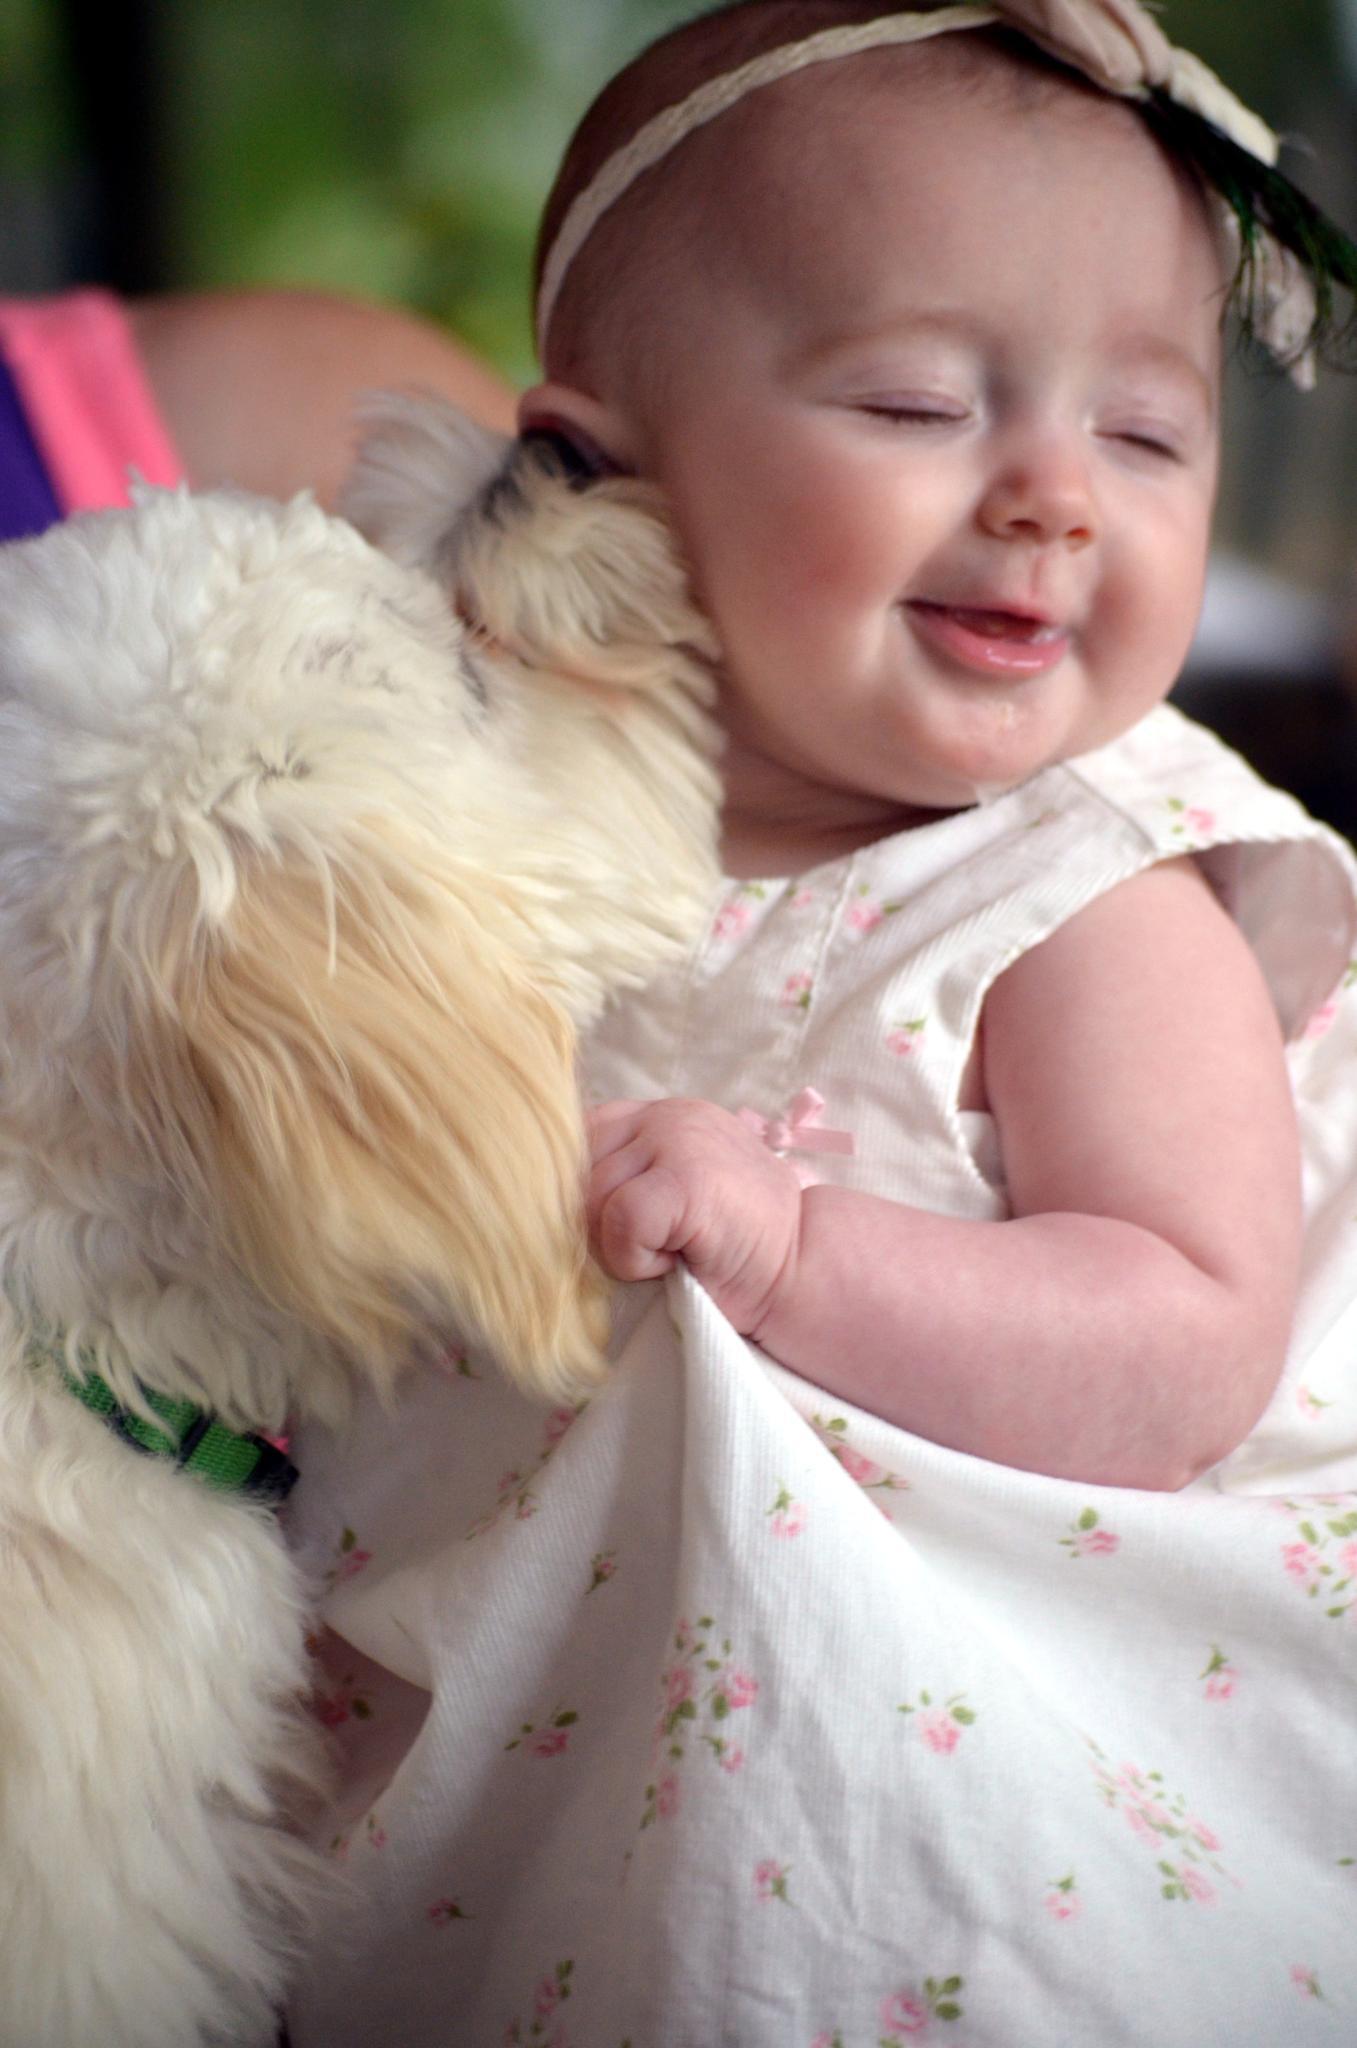 Puppy Kisses by cathy.paulet.zakrzewski